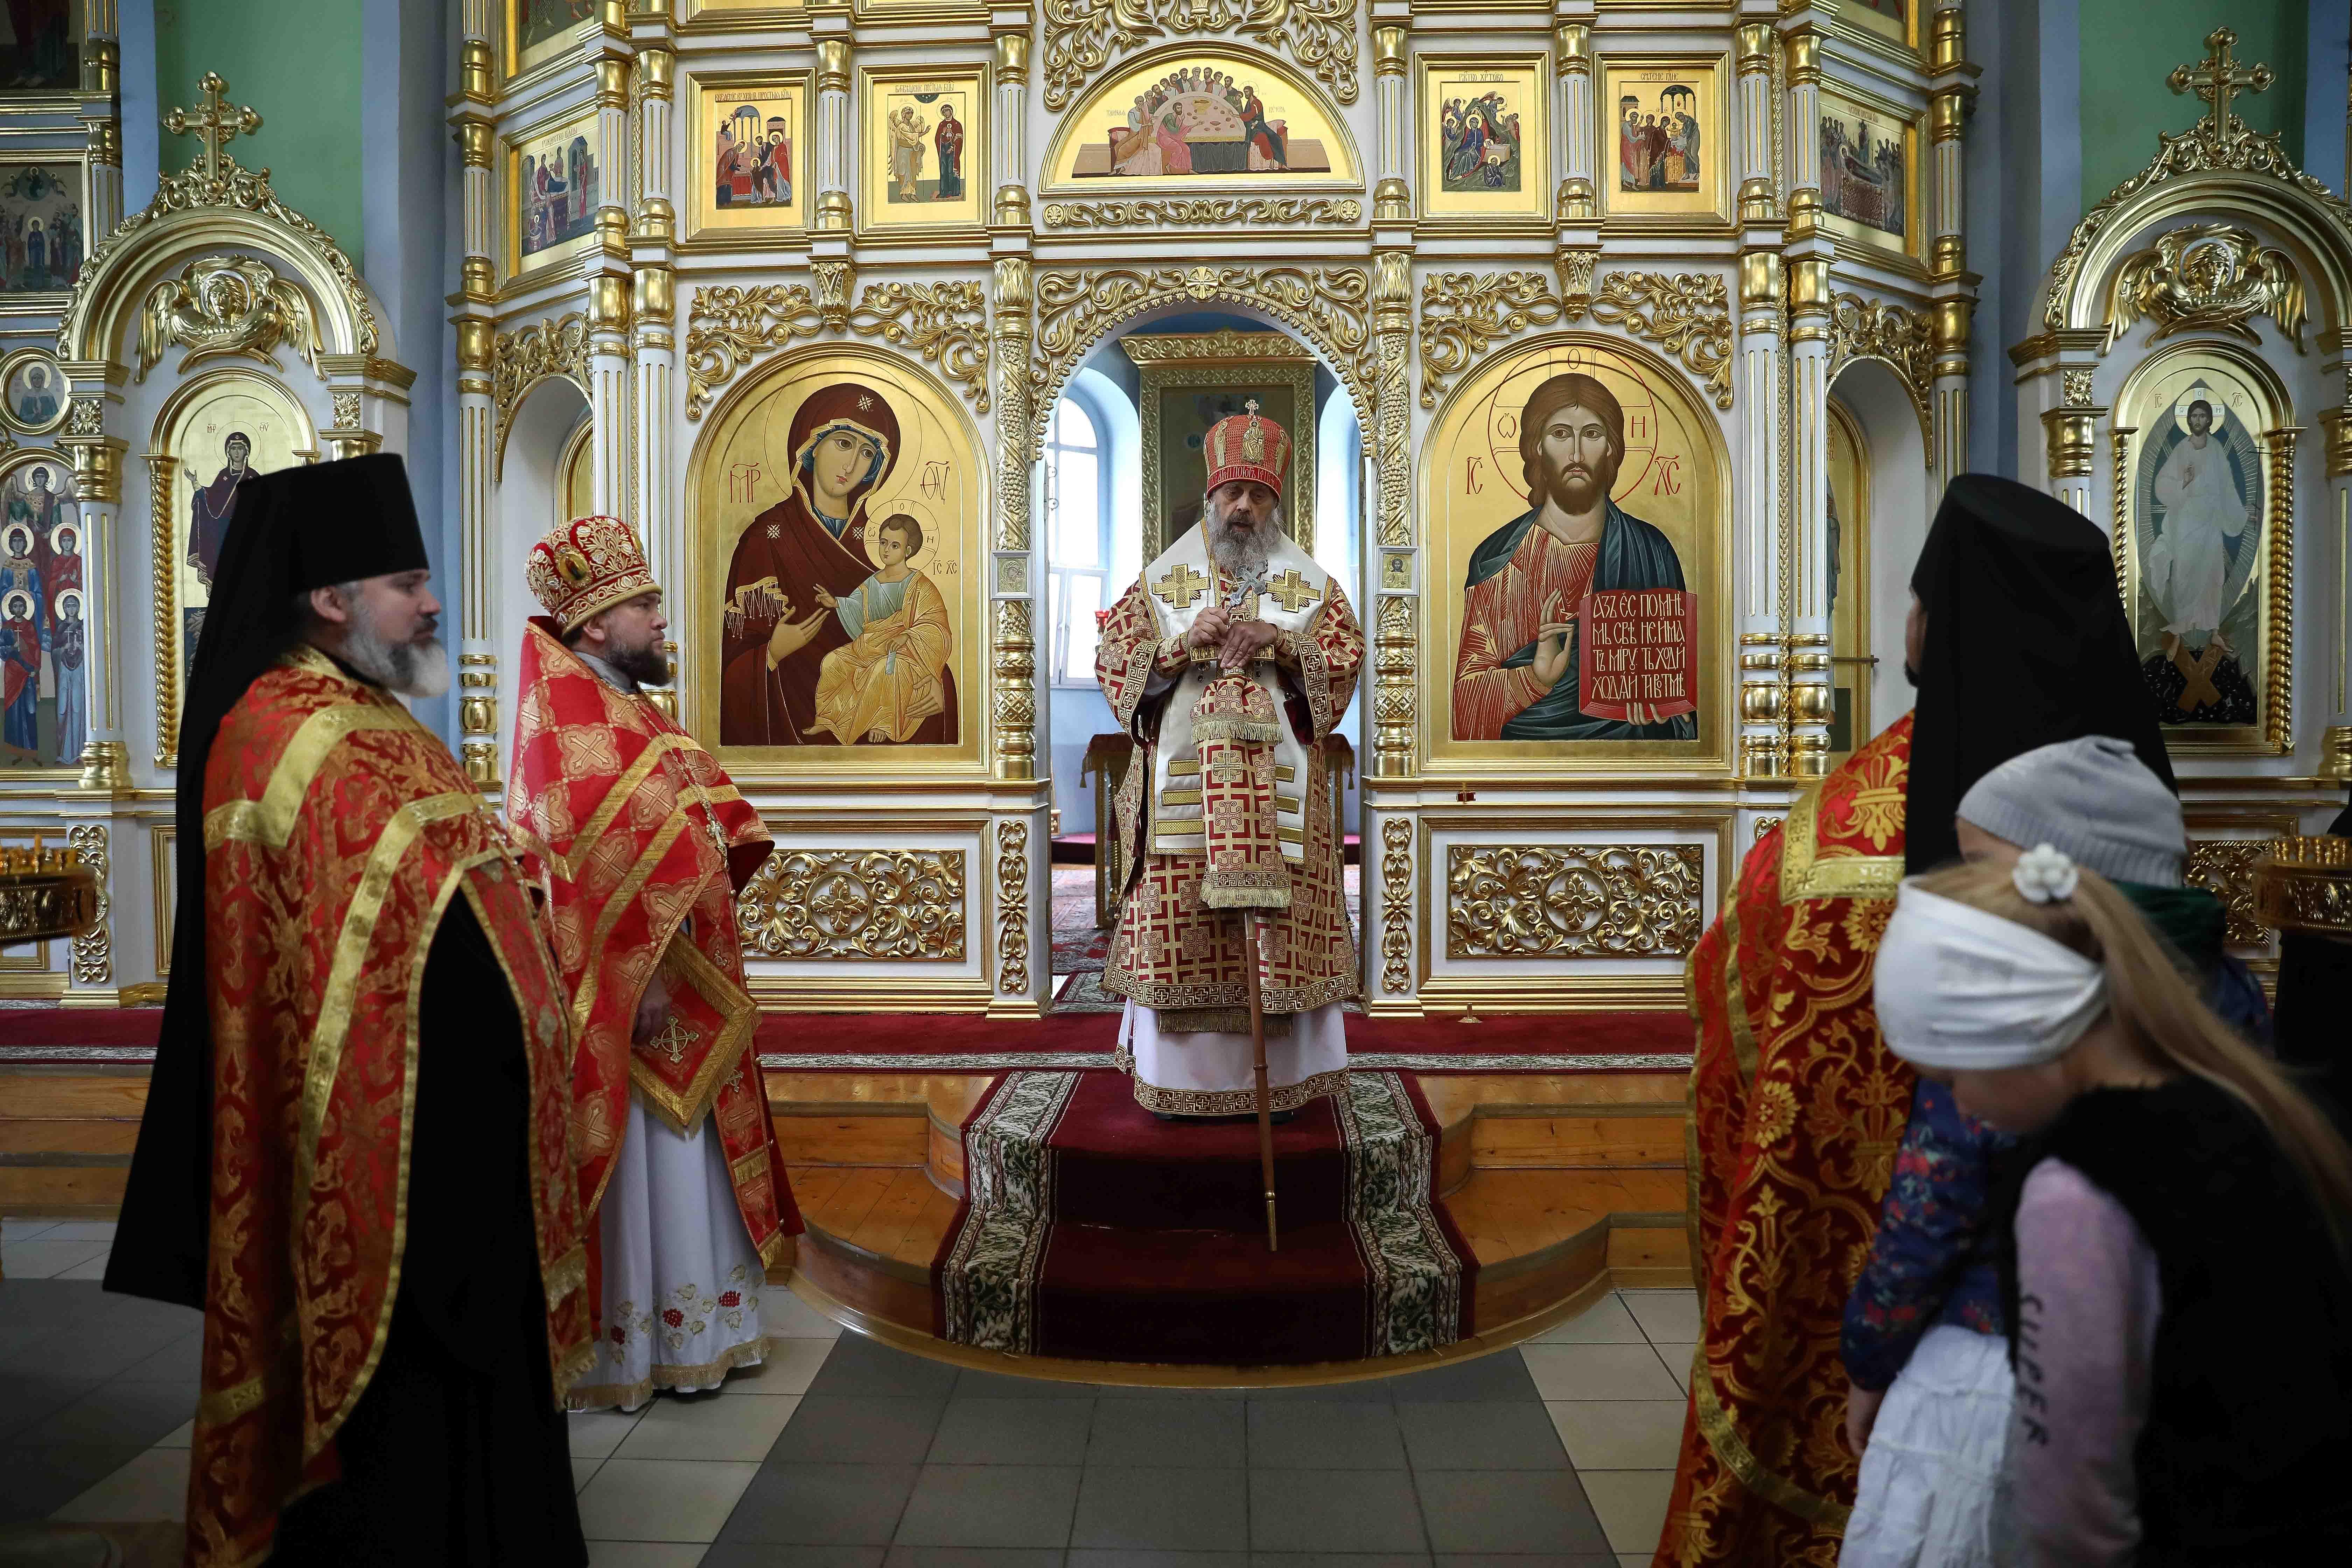 http://monuspen.ru/photoreports/6fe34d0b1744123e0a9091cd842914cc.jpg